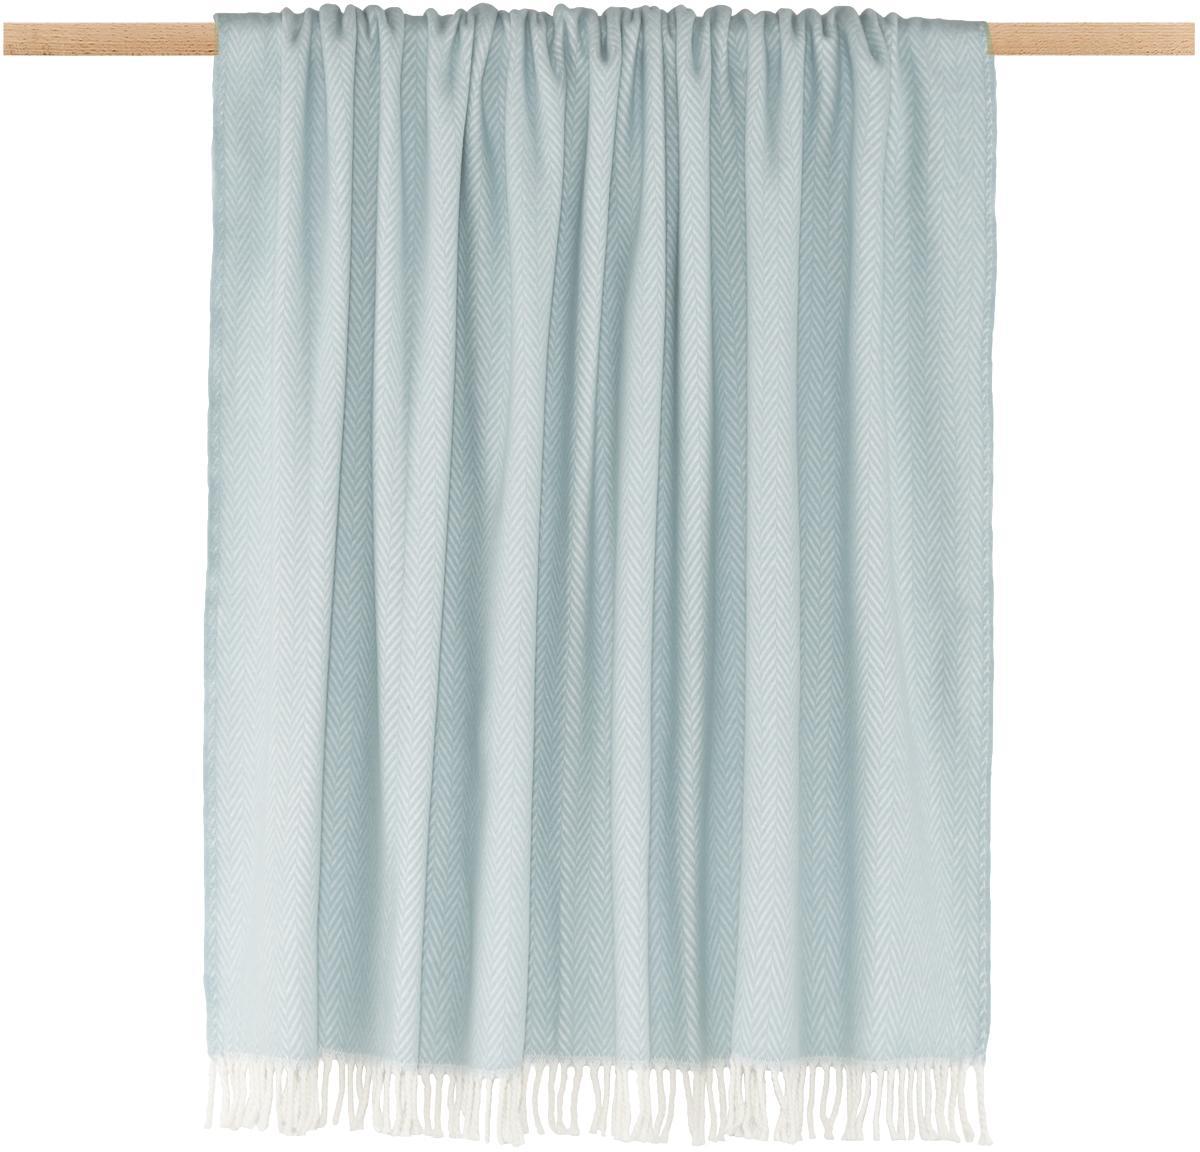 Plaid Skyline, 50% katoen, 50% acryl, Hemelsblauw, gebroken wit, 140 x 180 cm